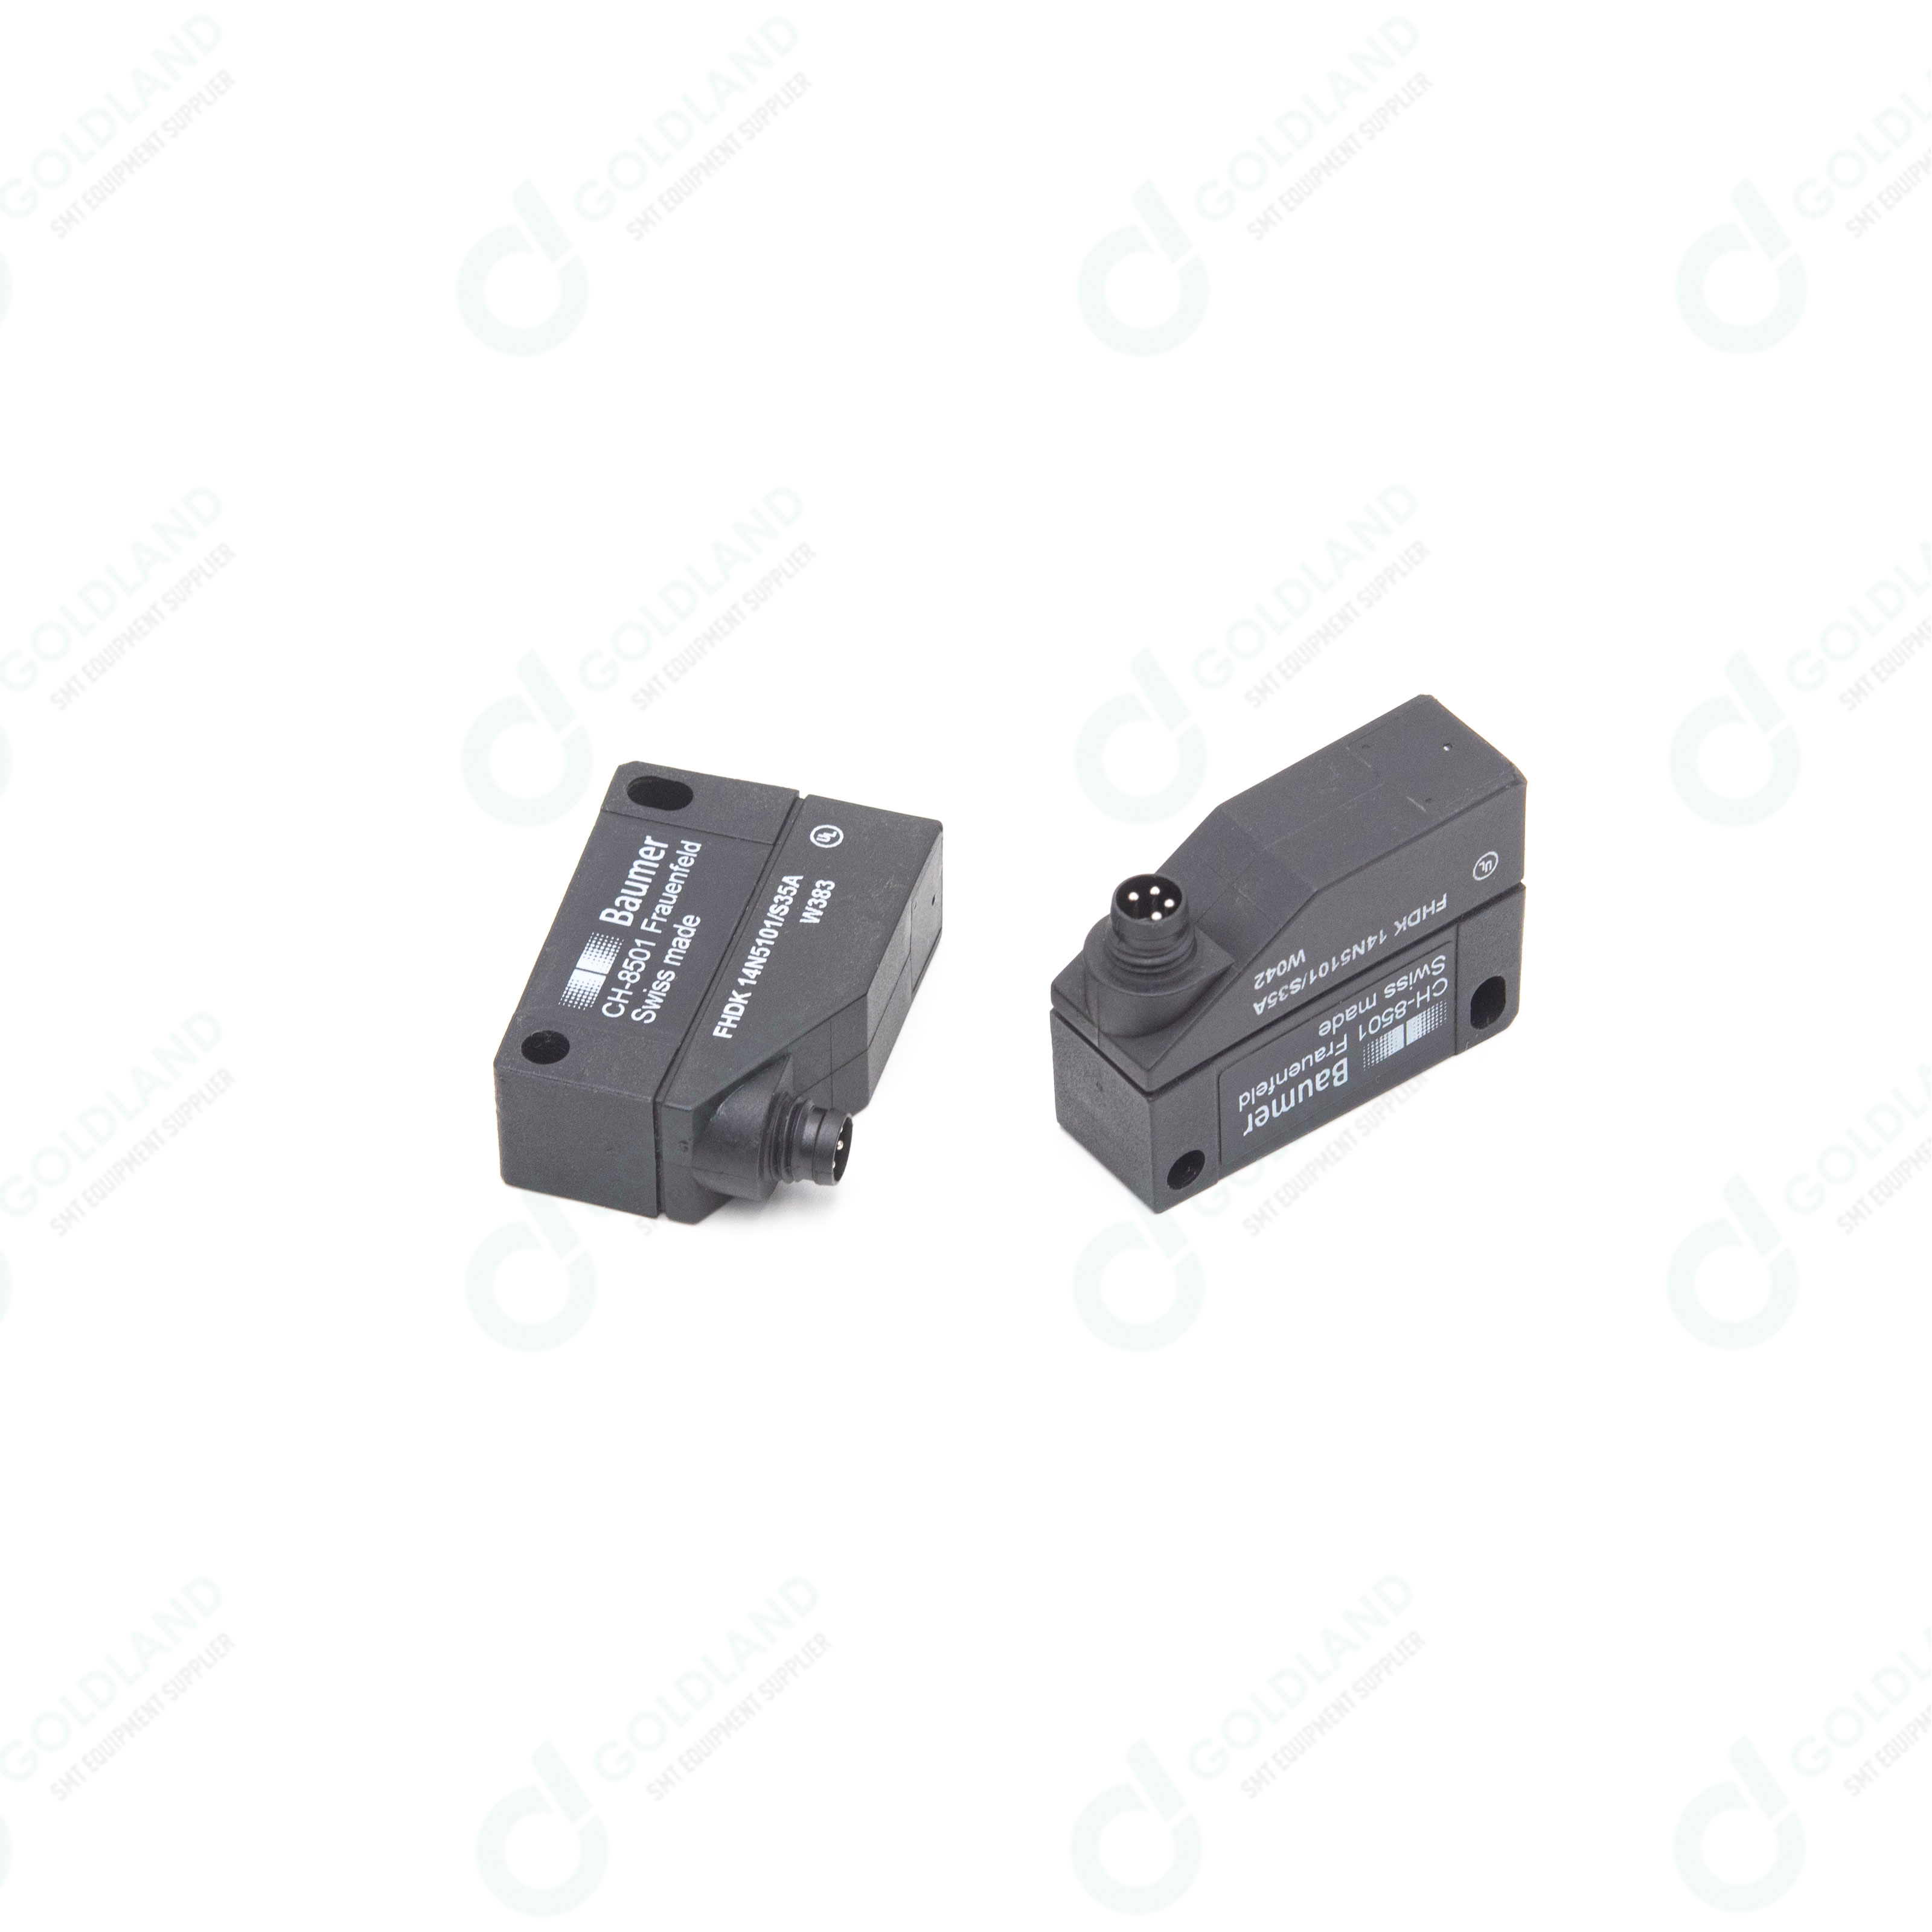 183388 Out Board Sensor Photo Electric DIFFUSE FHDK 14N5101 S35A DEK Printer Spare Parts